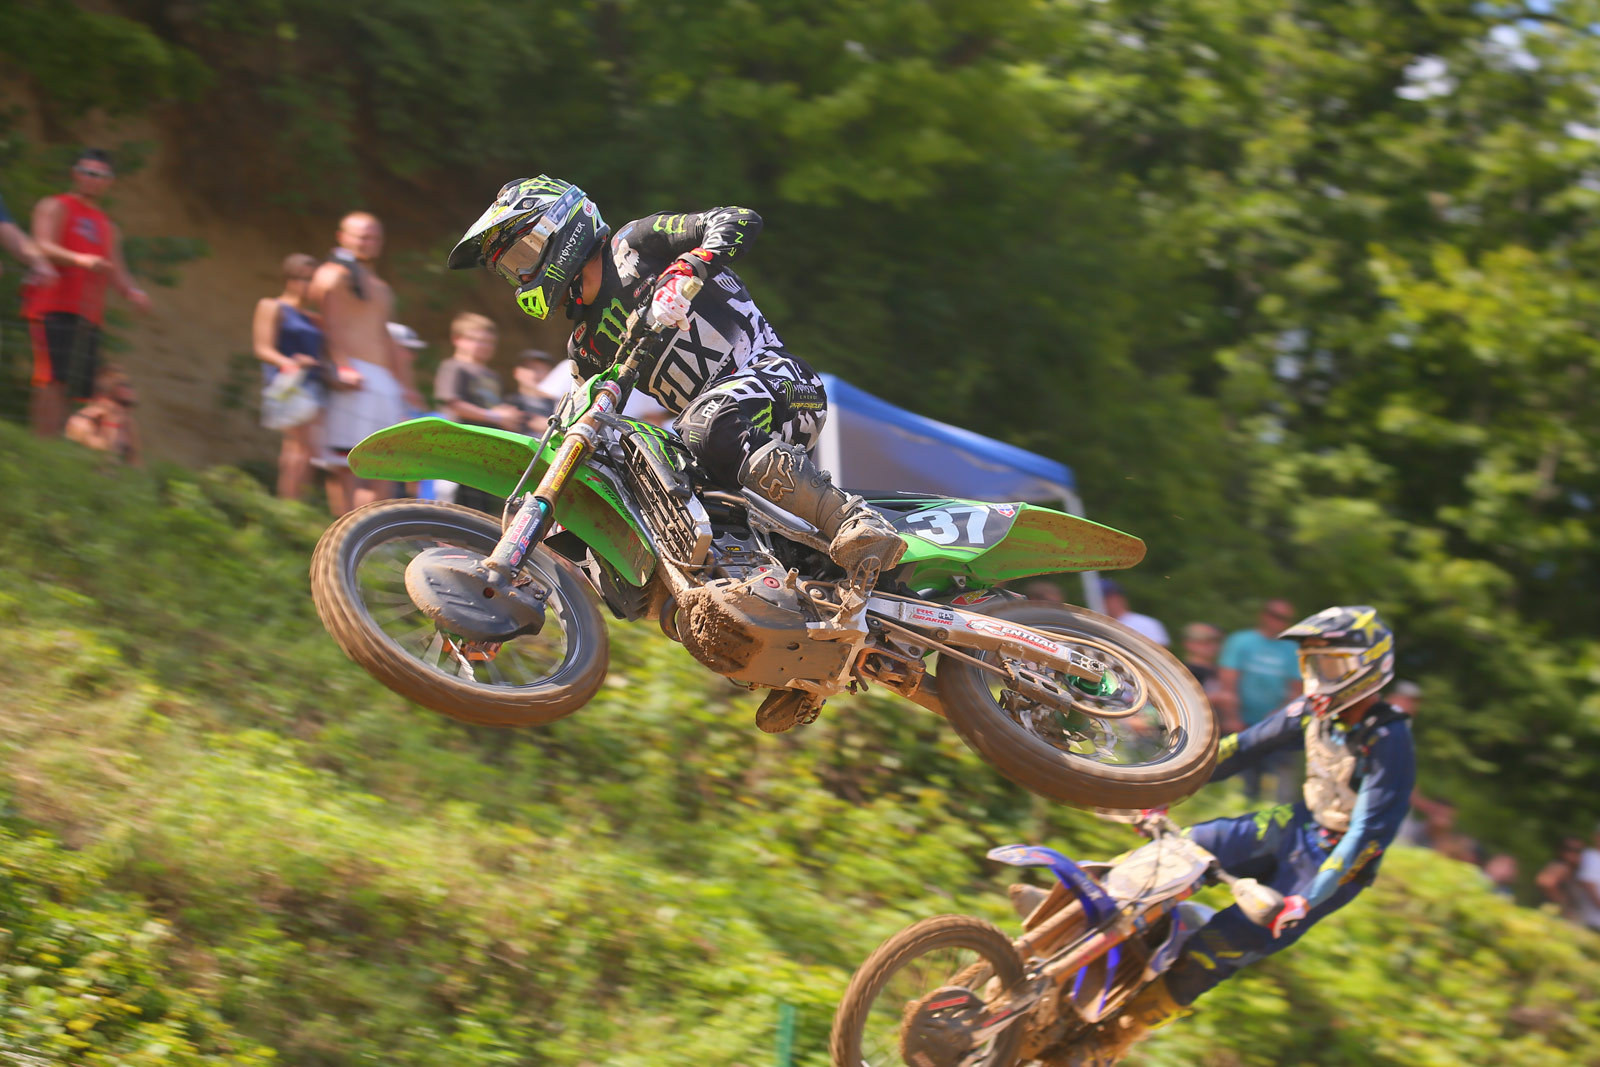 Joey Savatgy and Aaron Plessinger - Photo Blast: Spring Creek - Motocross Pictures - Vital MX